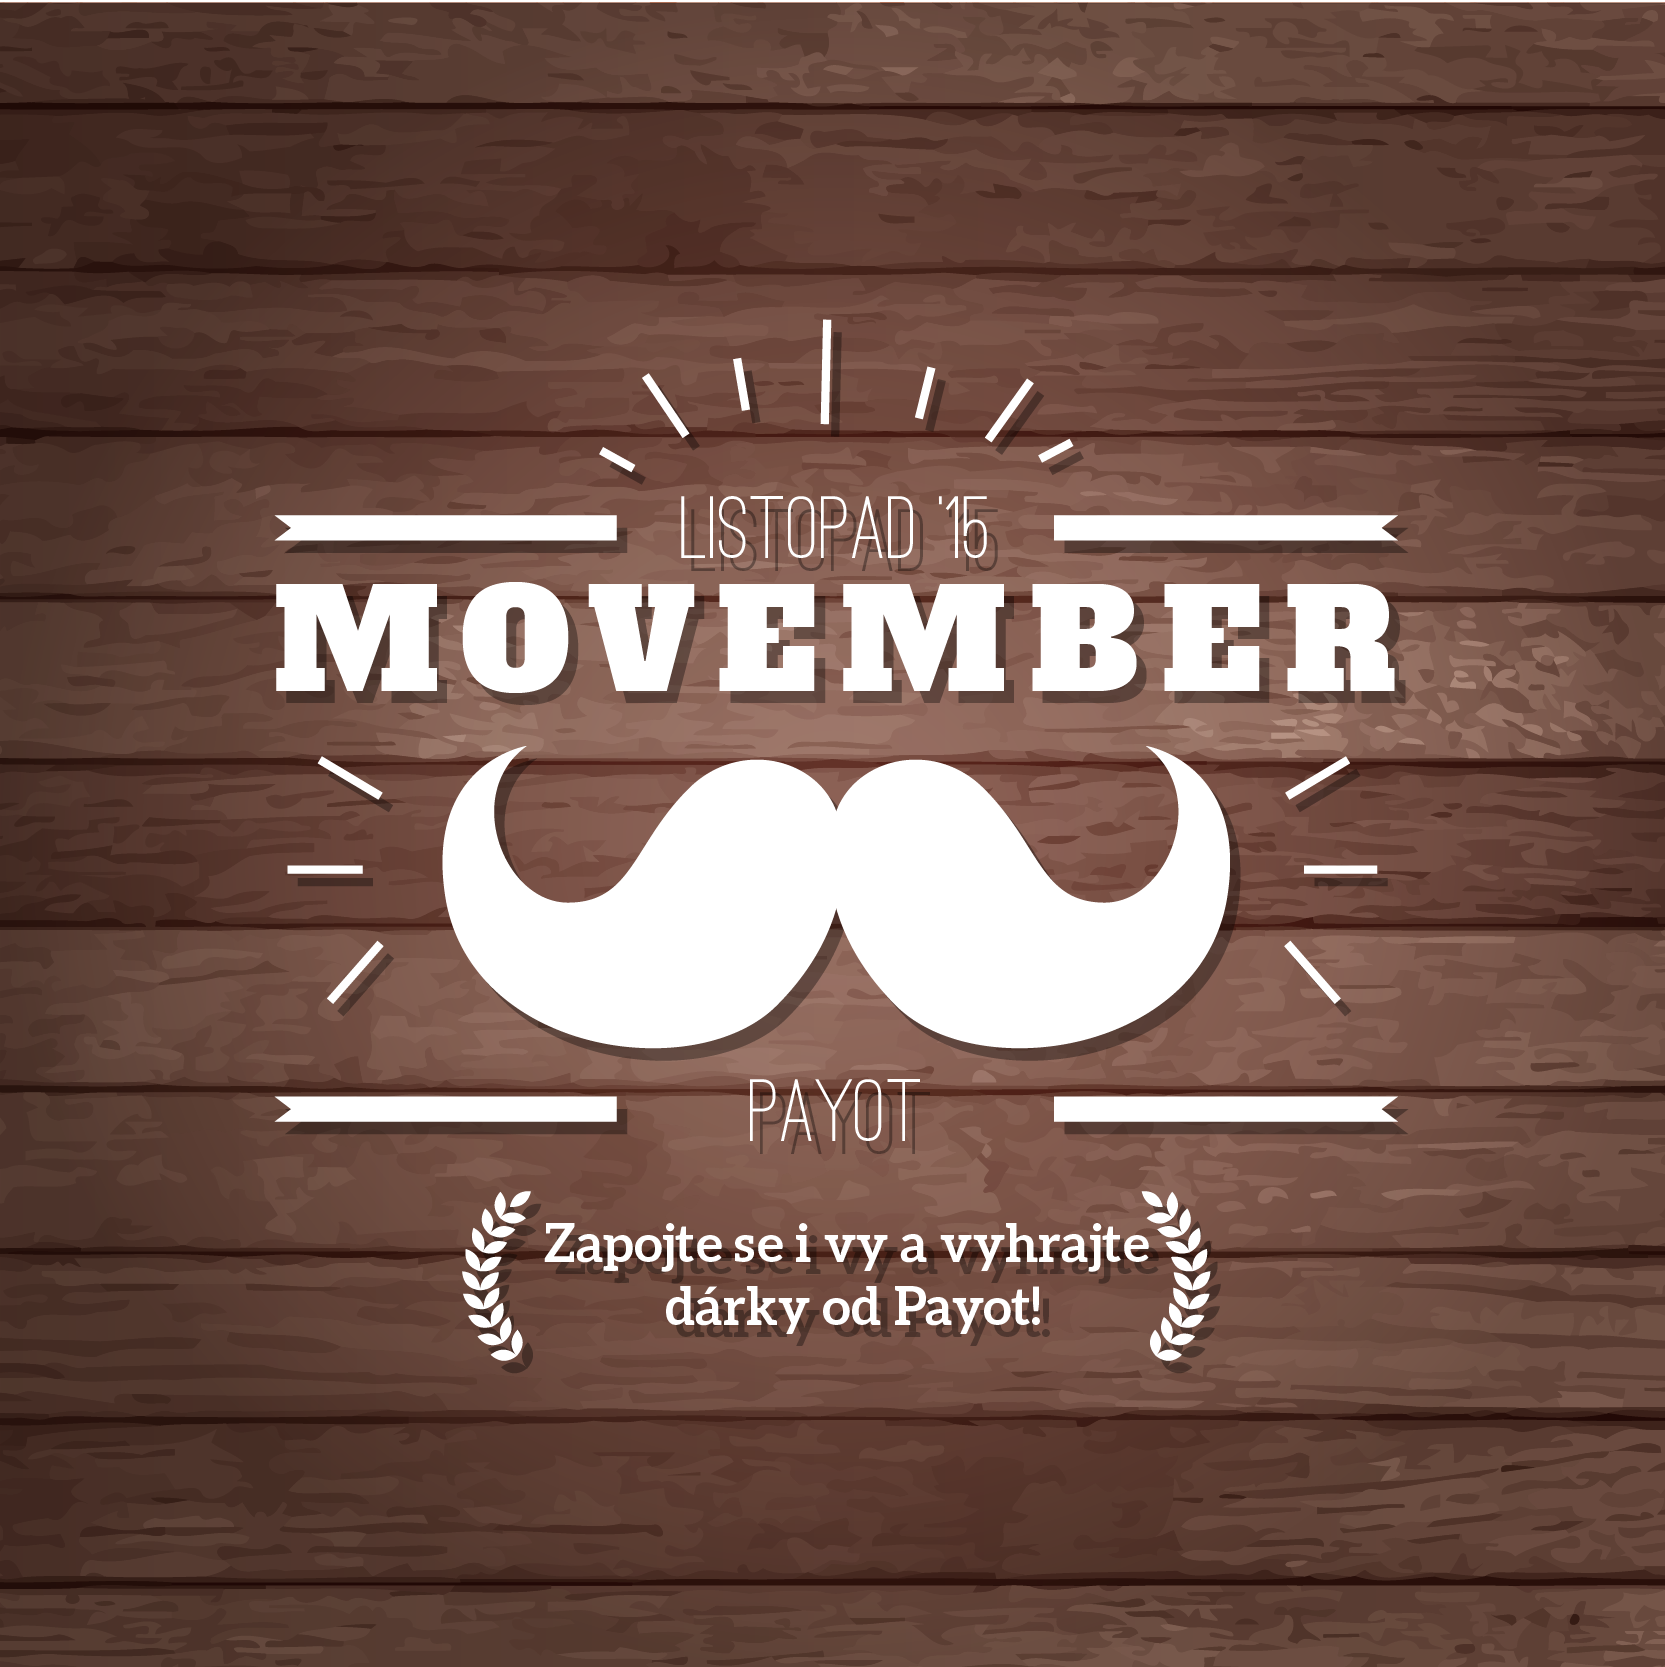 Payot_movember